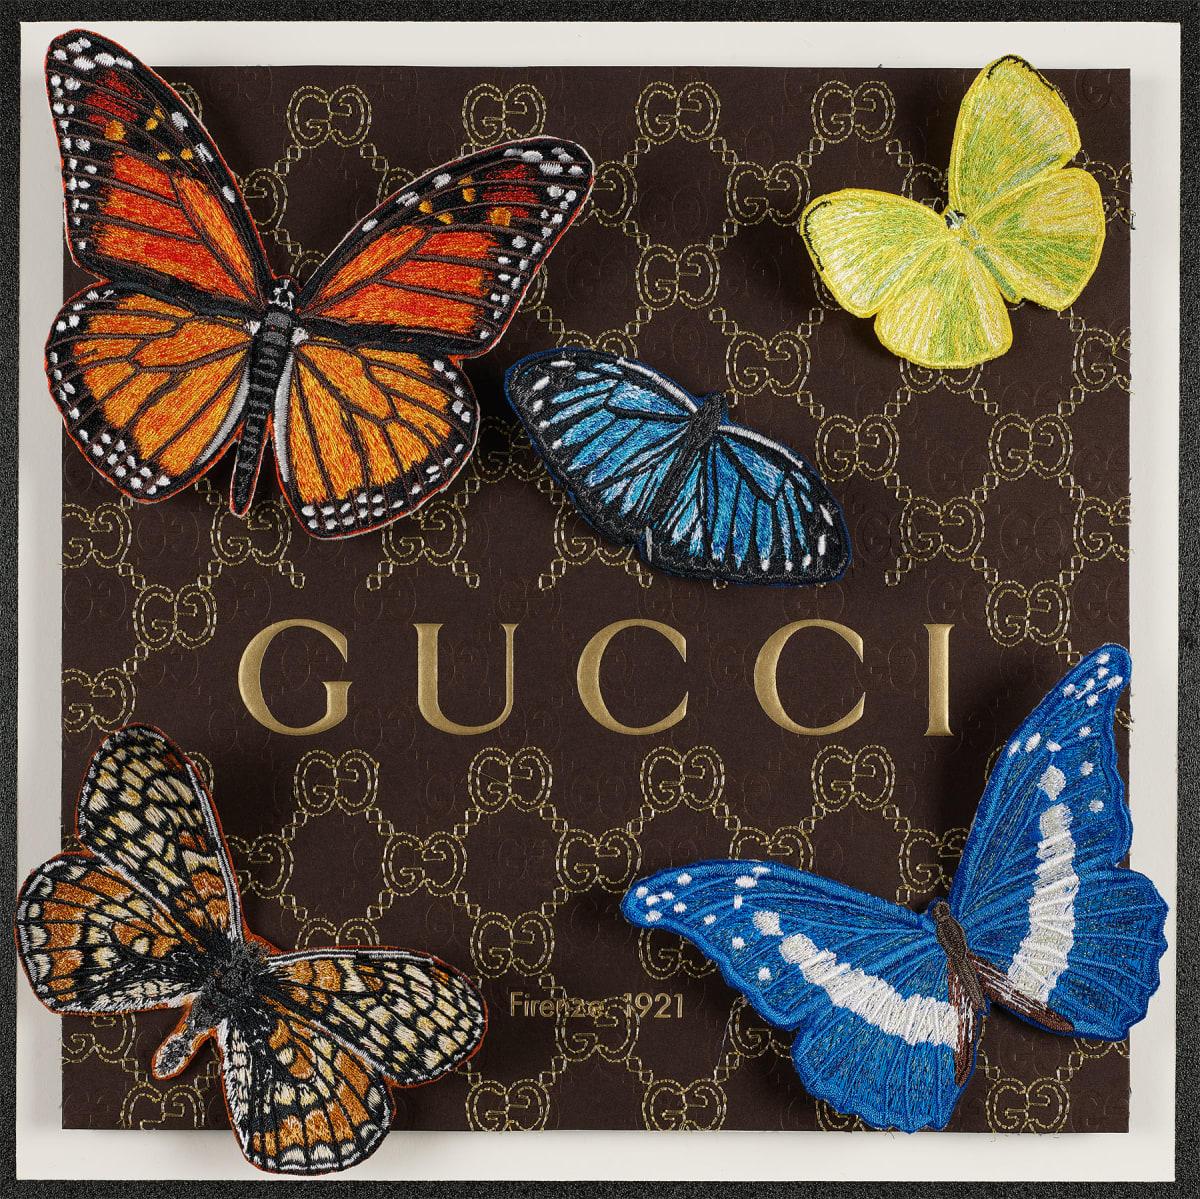 Stephen Wilson, Gucci Gathering V, 2020